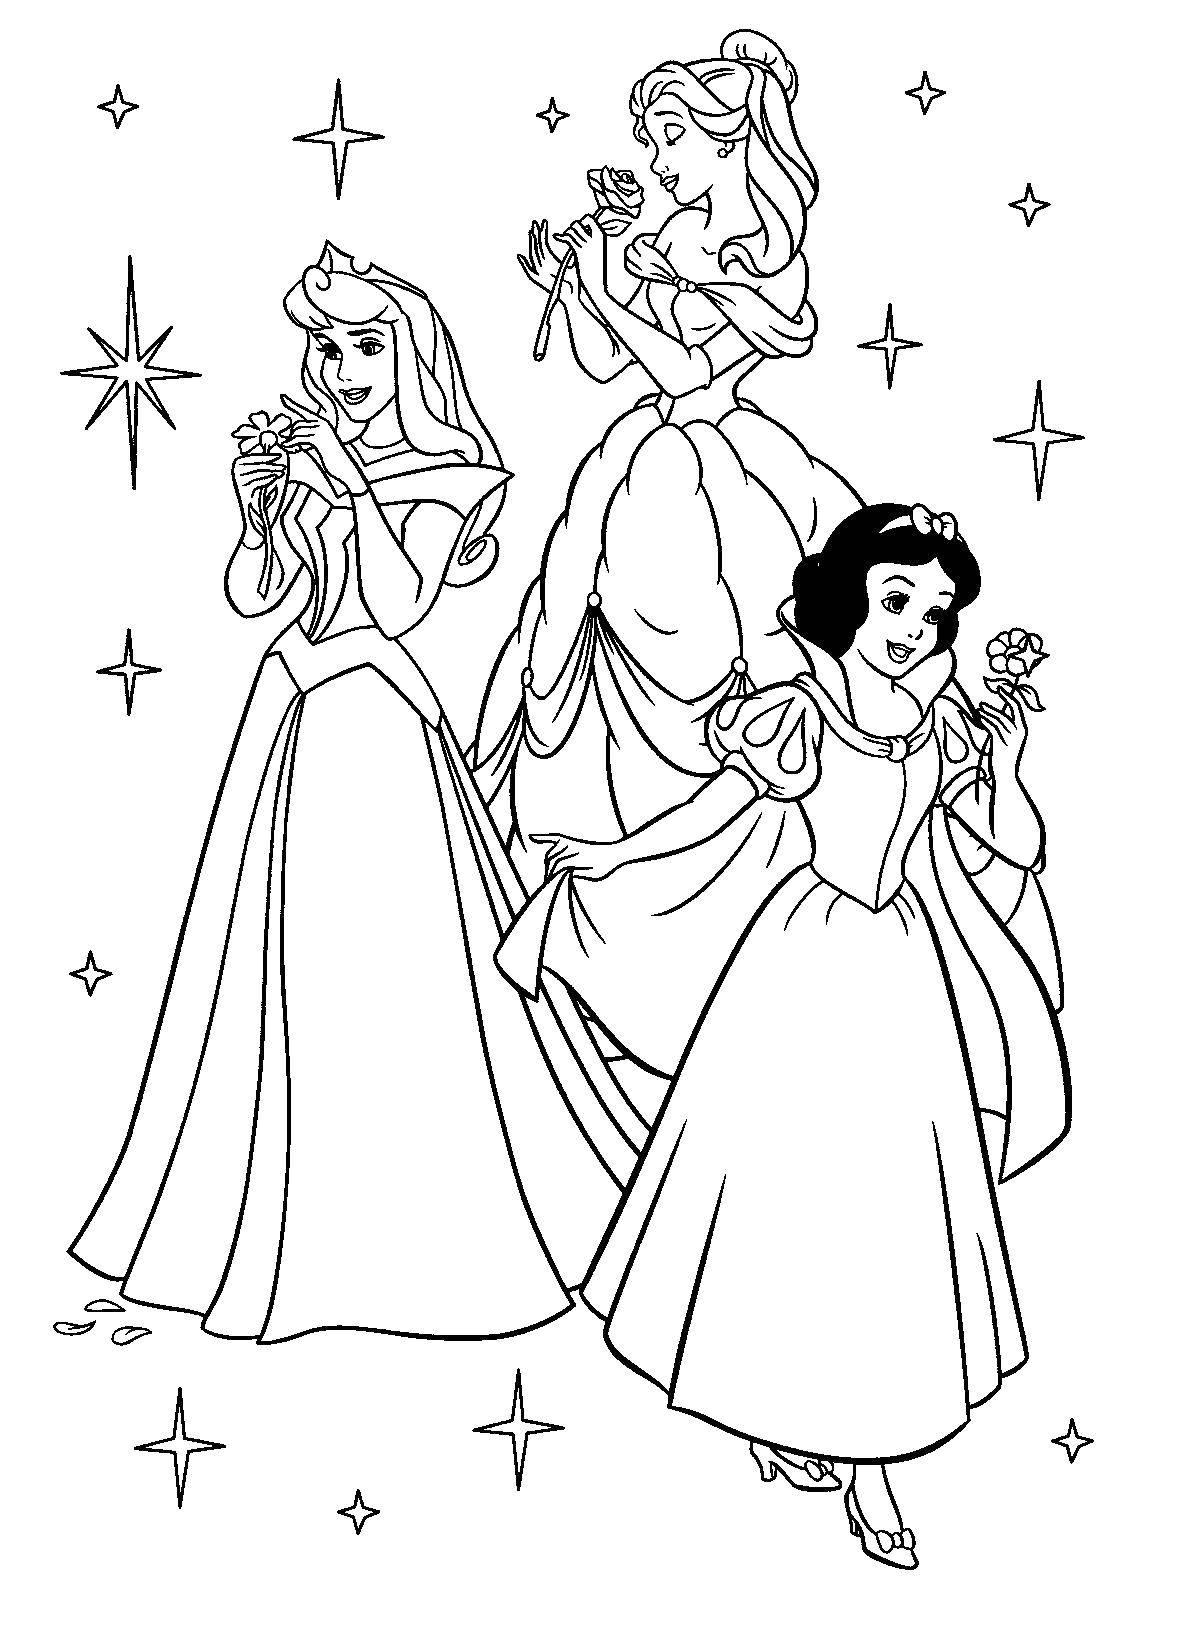 Раскраска Принцессы диснея Скачать принцессы.  Распечатать ,Принцессы,